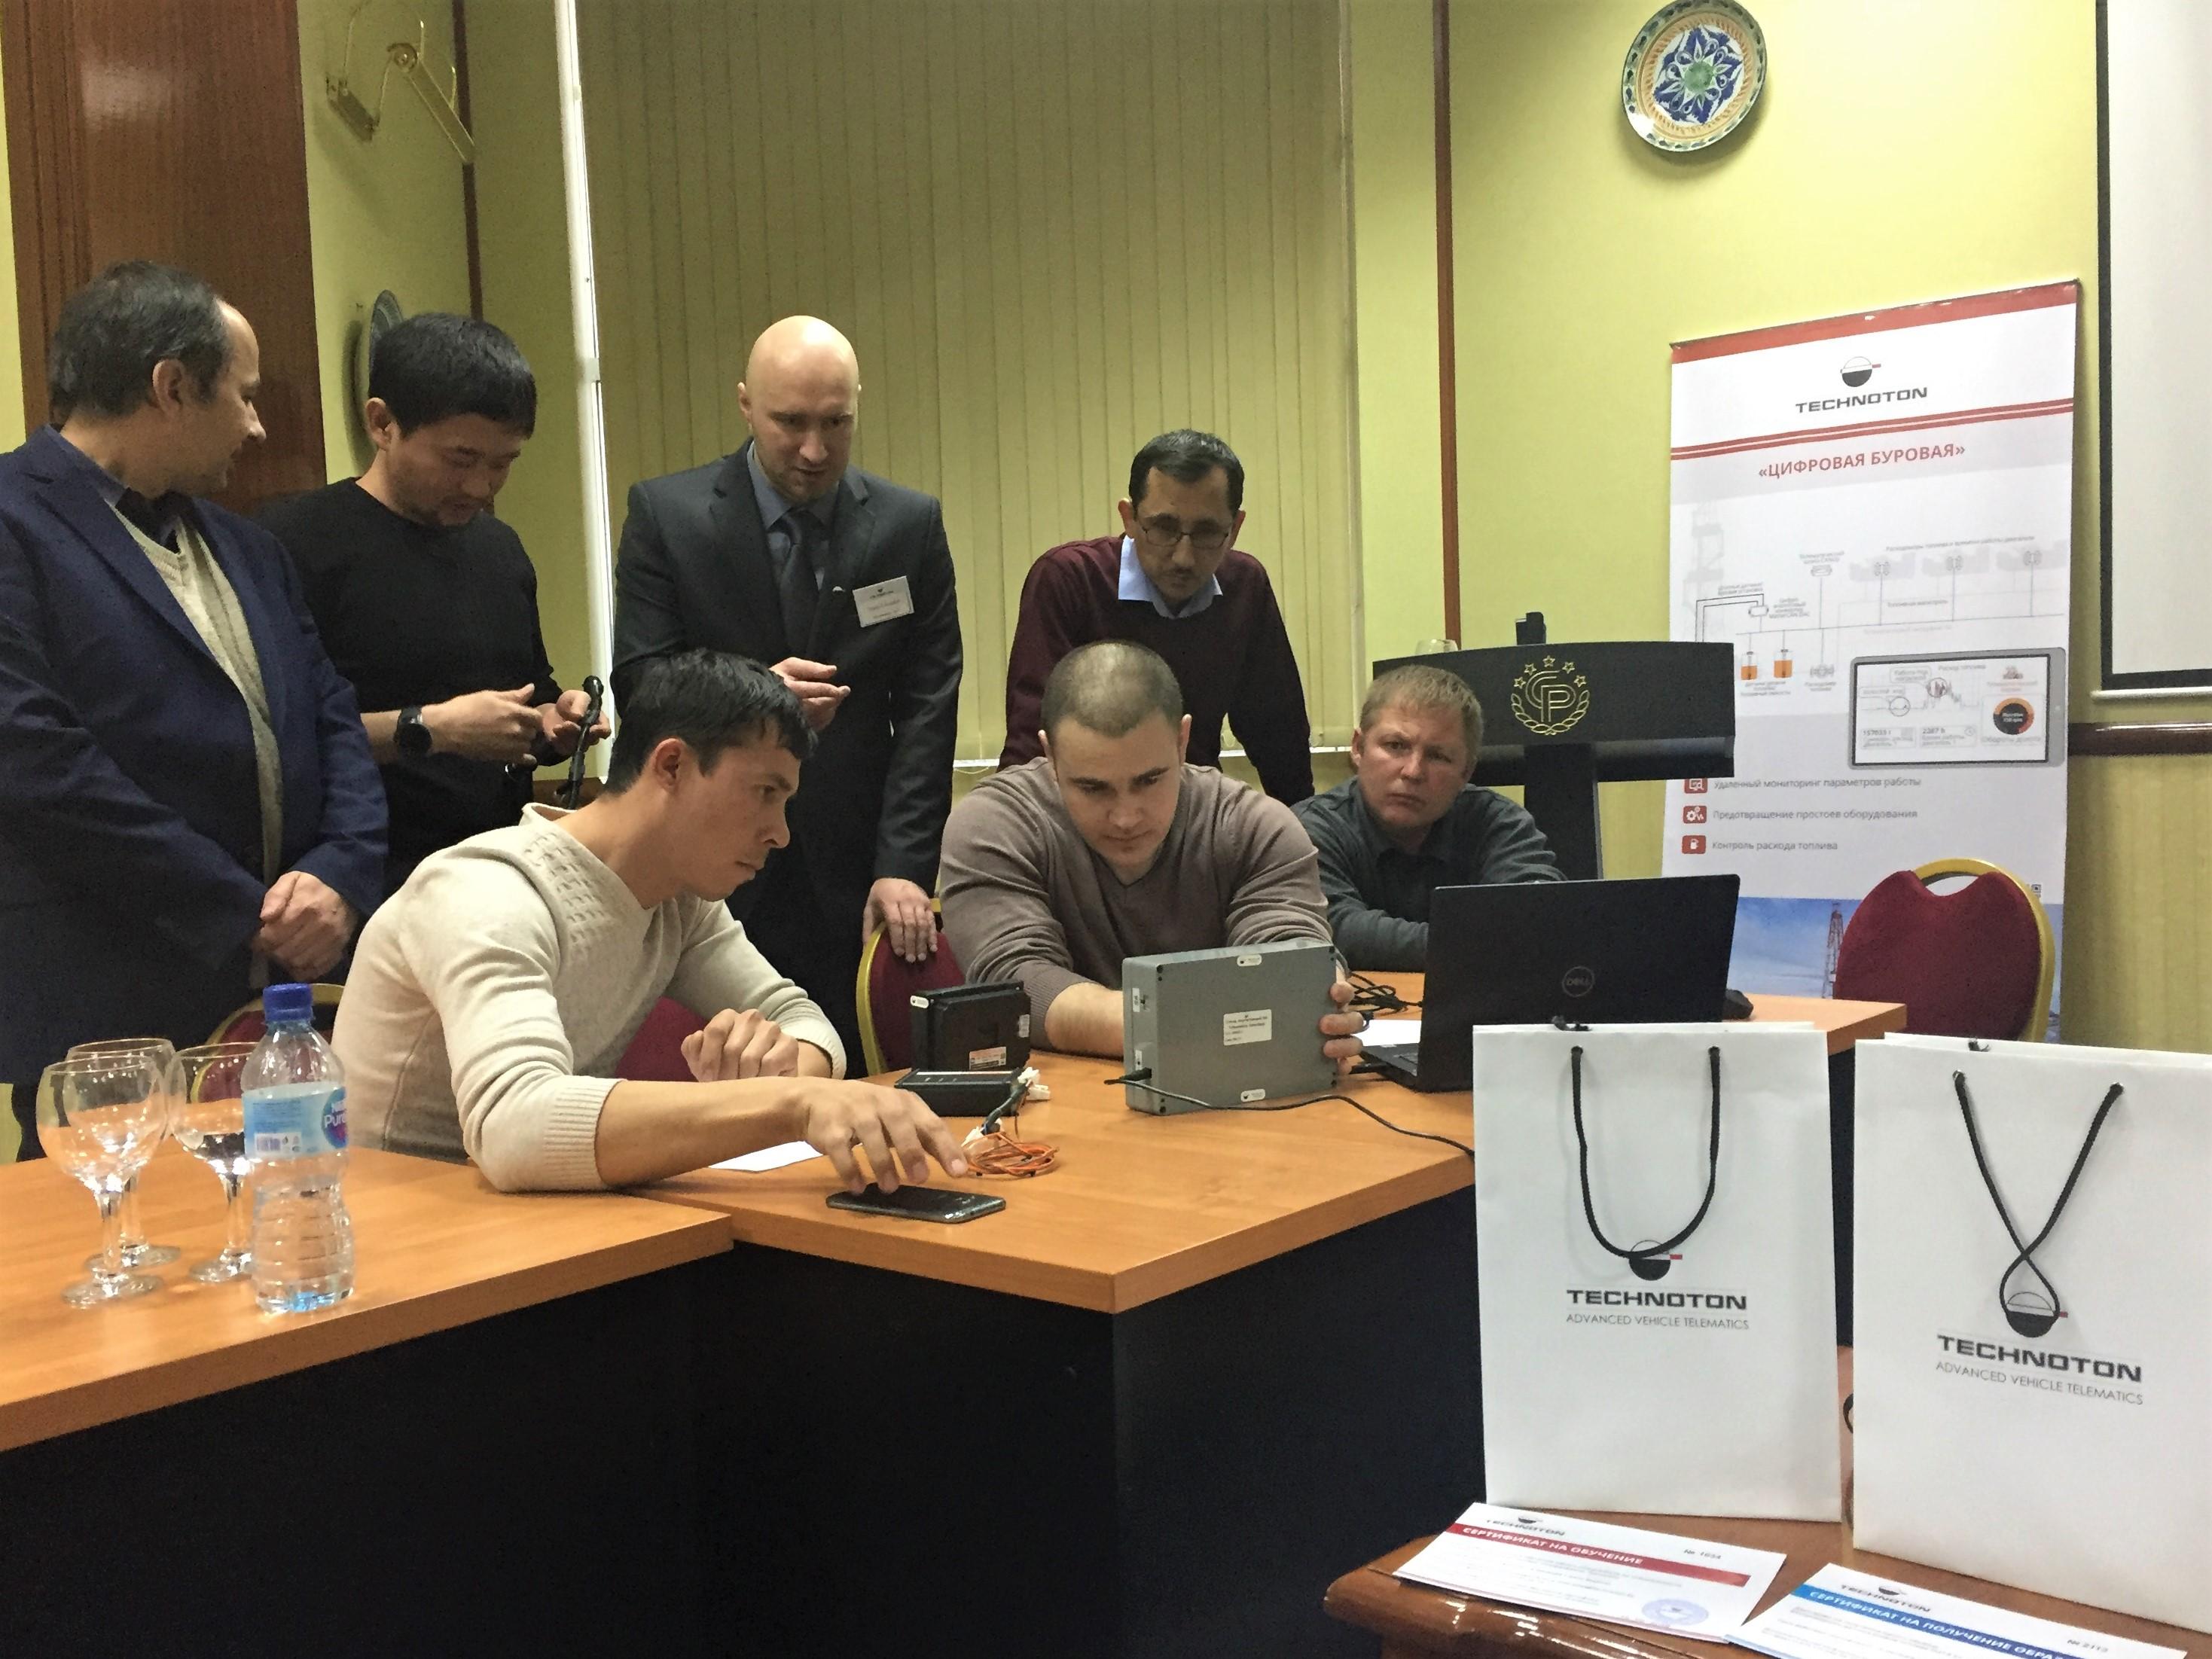 Семинары Технотон в Ташкенте и Астане